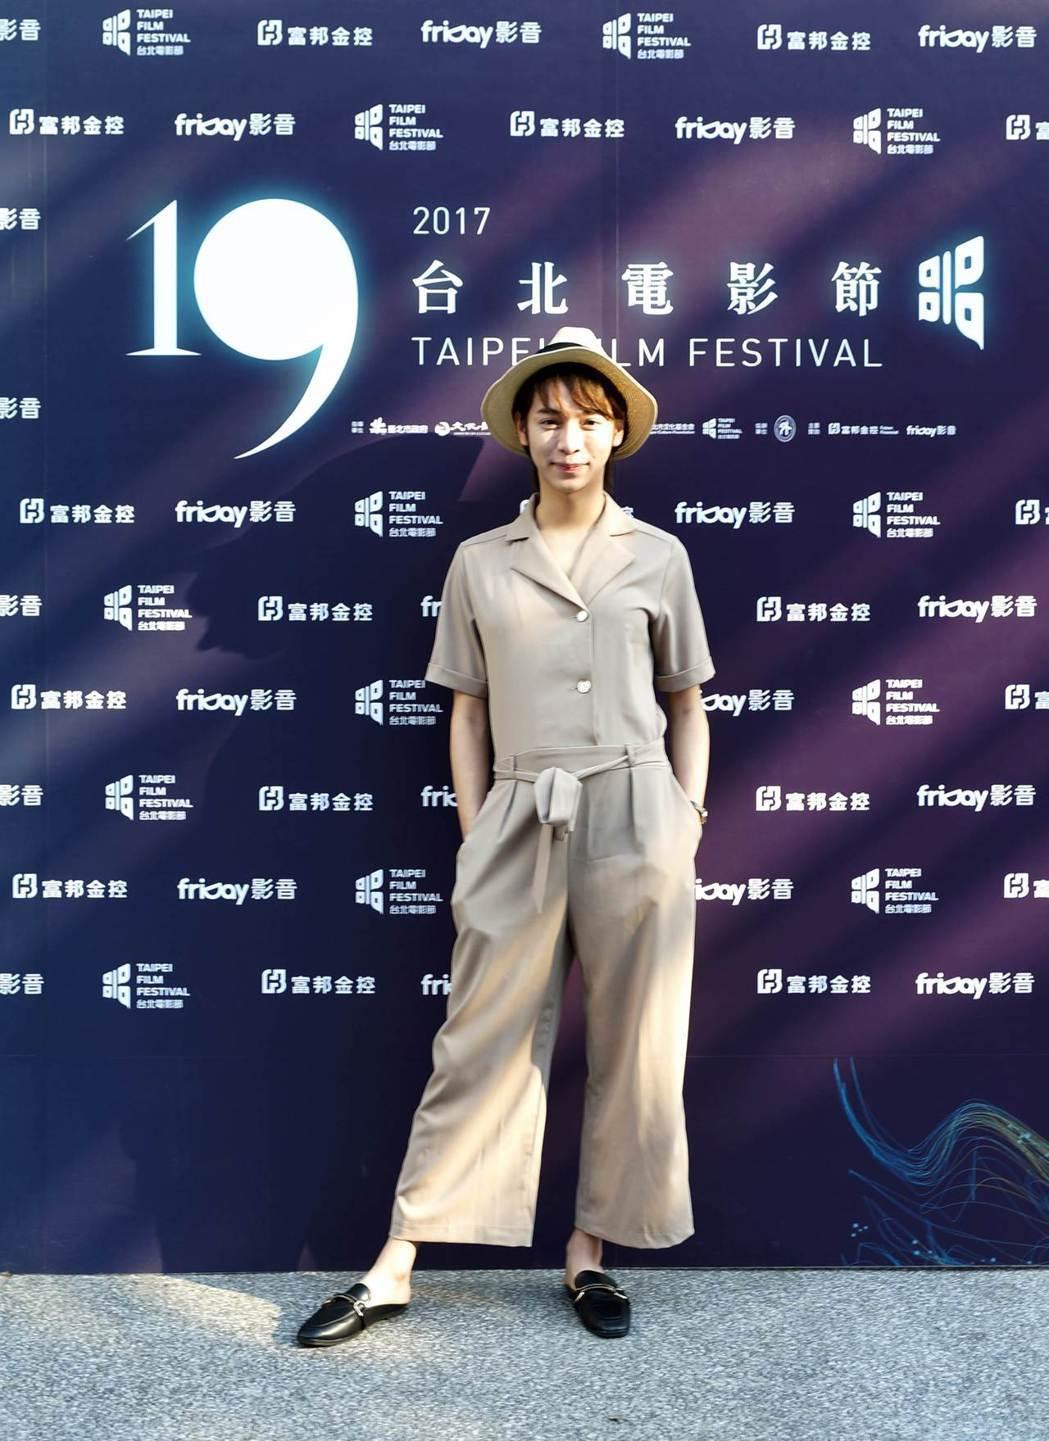 Kiwebaby出席「自畫像」在台北電影節的首映,造型風格兼具兩性特色。圖/海鵬